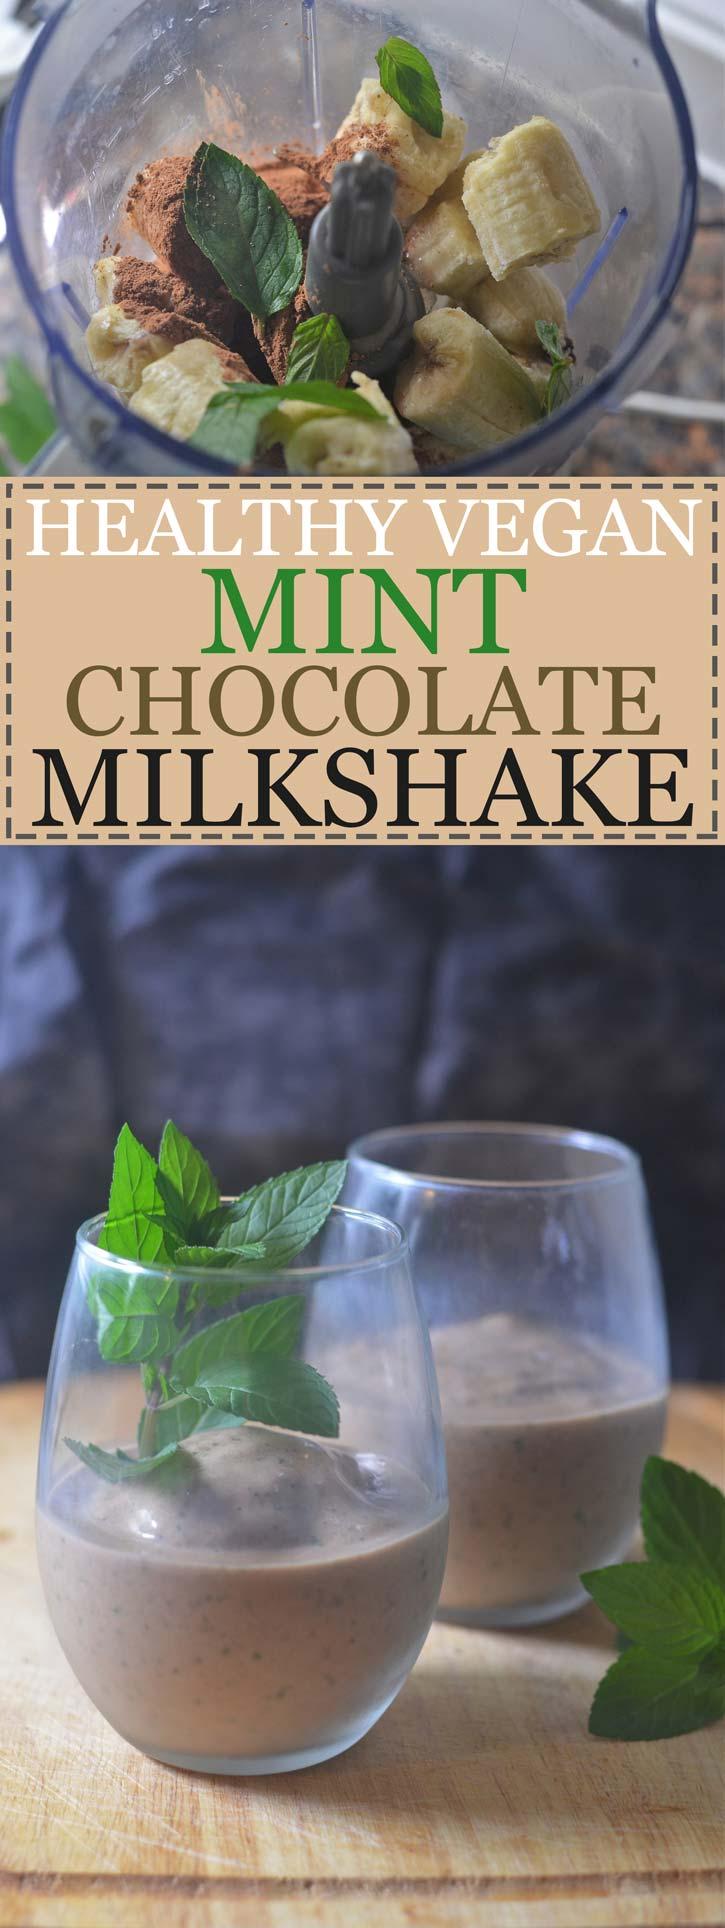 healthy vegan mint chocolate shake milkshake